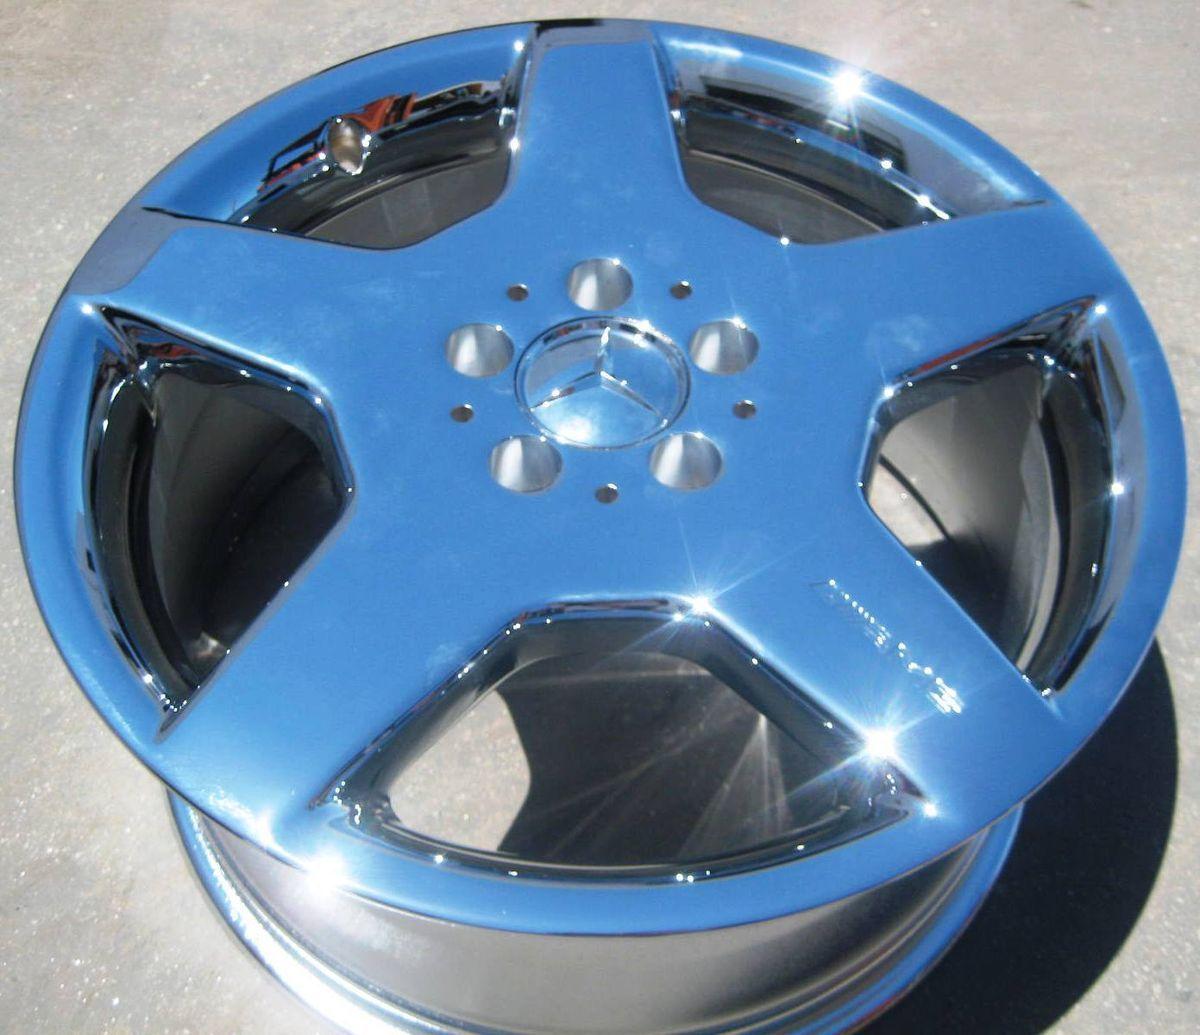 18 Factory Mercedes CL500 S600 AMG Chrome Wheel Rim 1